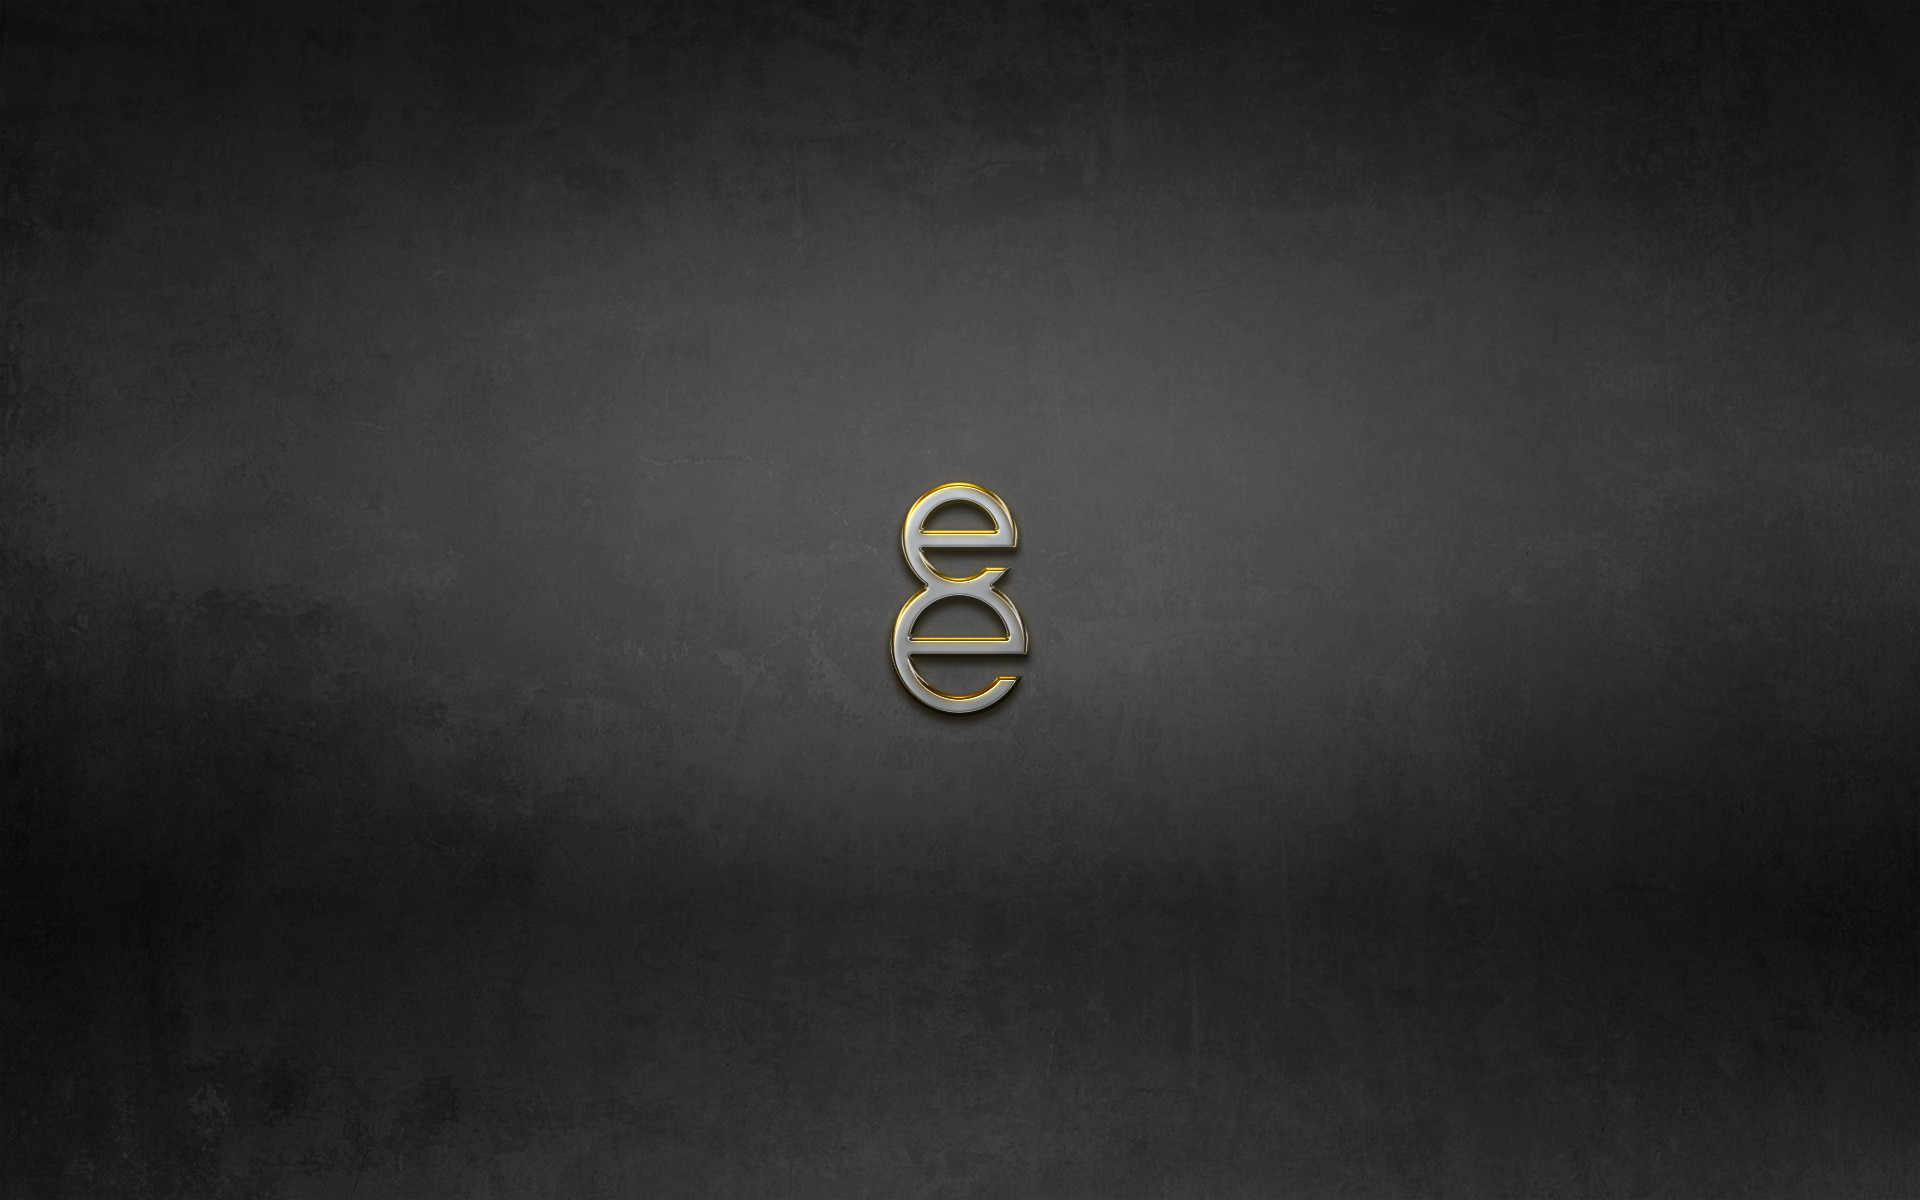 8e Gold Logo Dark Grunge Texture Desktop Wallpaper Uploaded by esnooze